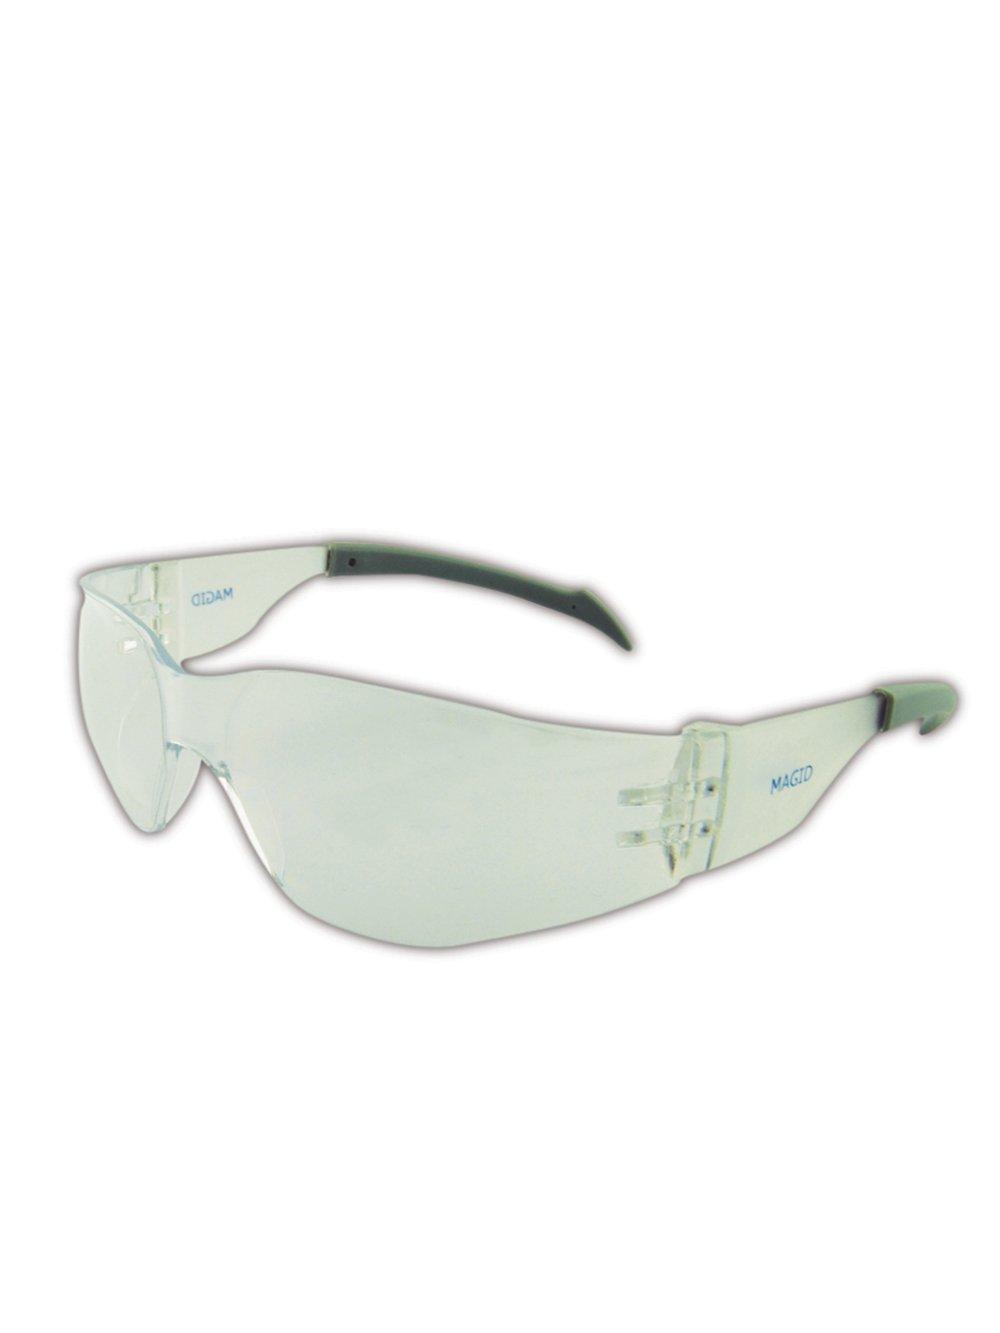 Magid Y15CFAFC Gemstone Myst Flex Protective Eyewears with Anti-Fog Coating One Pair Clear Lens and Frame